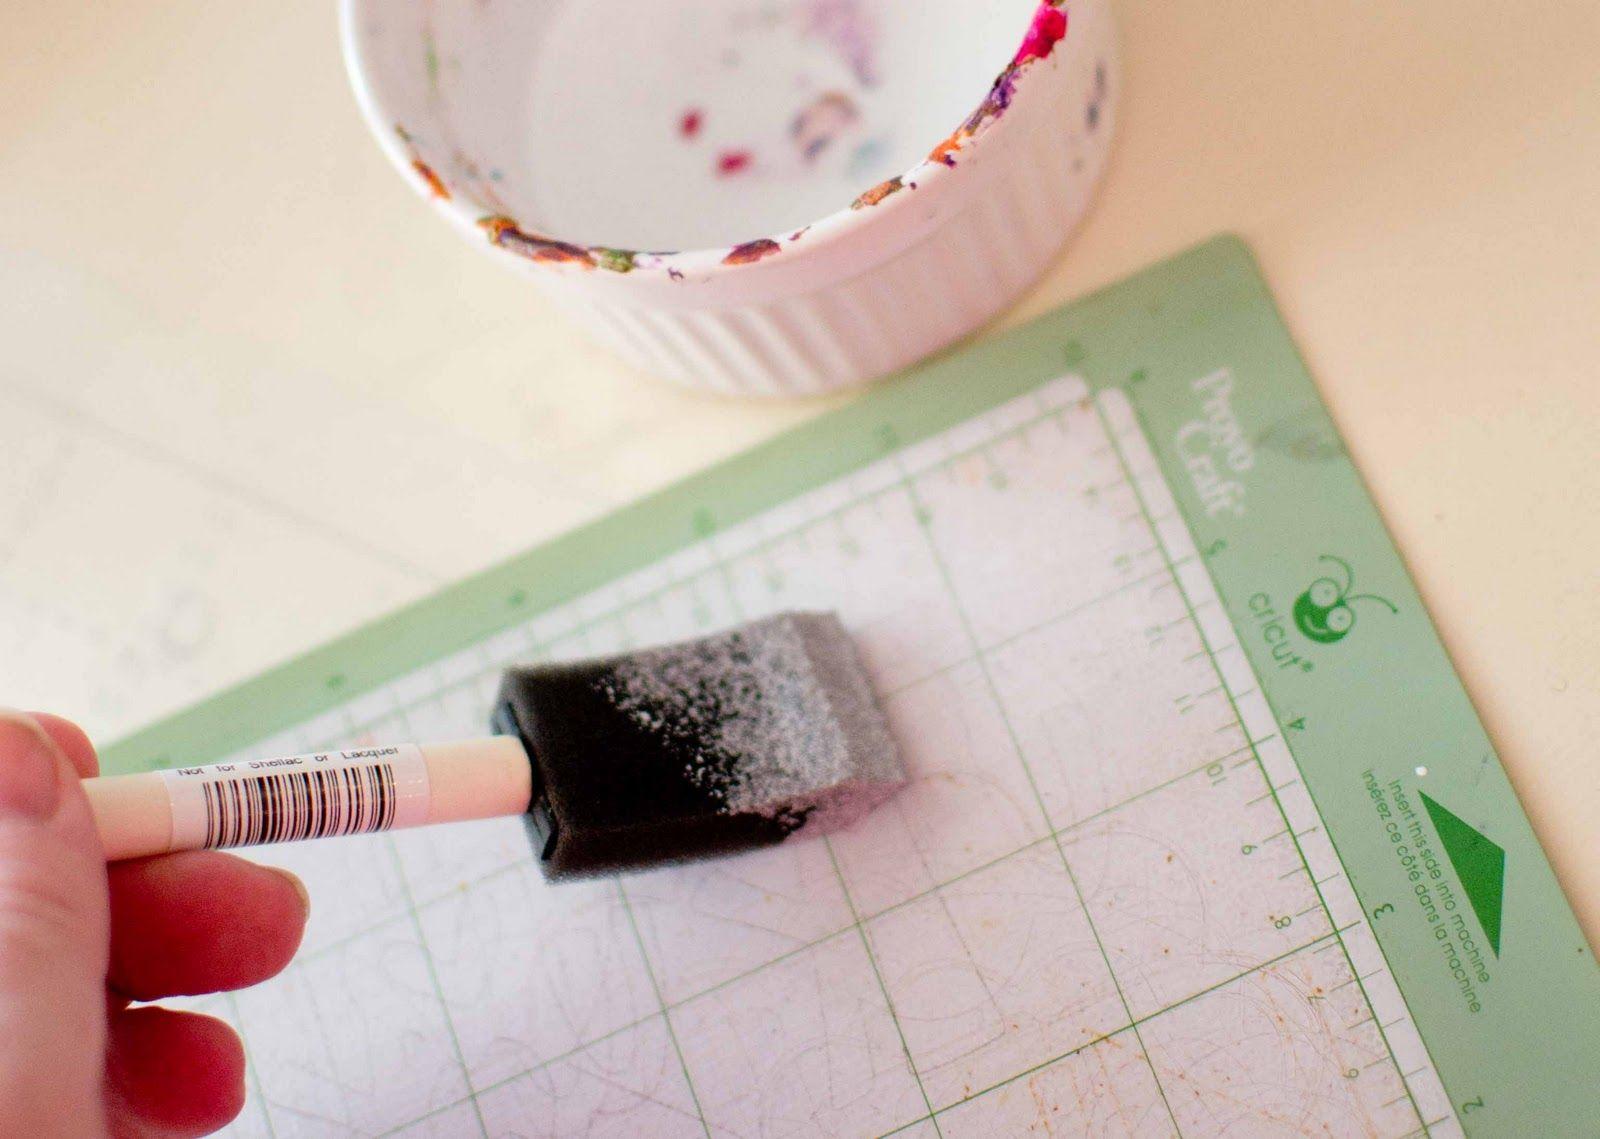 Pin By Natalie Rodgers On Diy Crafting Cricut Mat Scrapbooking Cricut Cricut Crafts